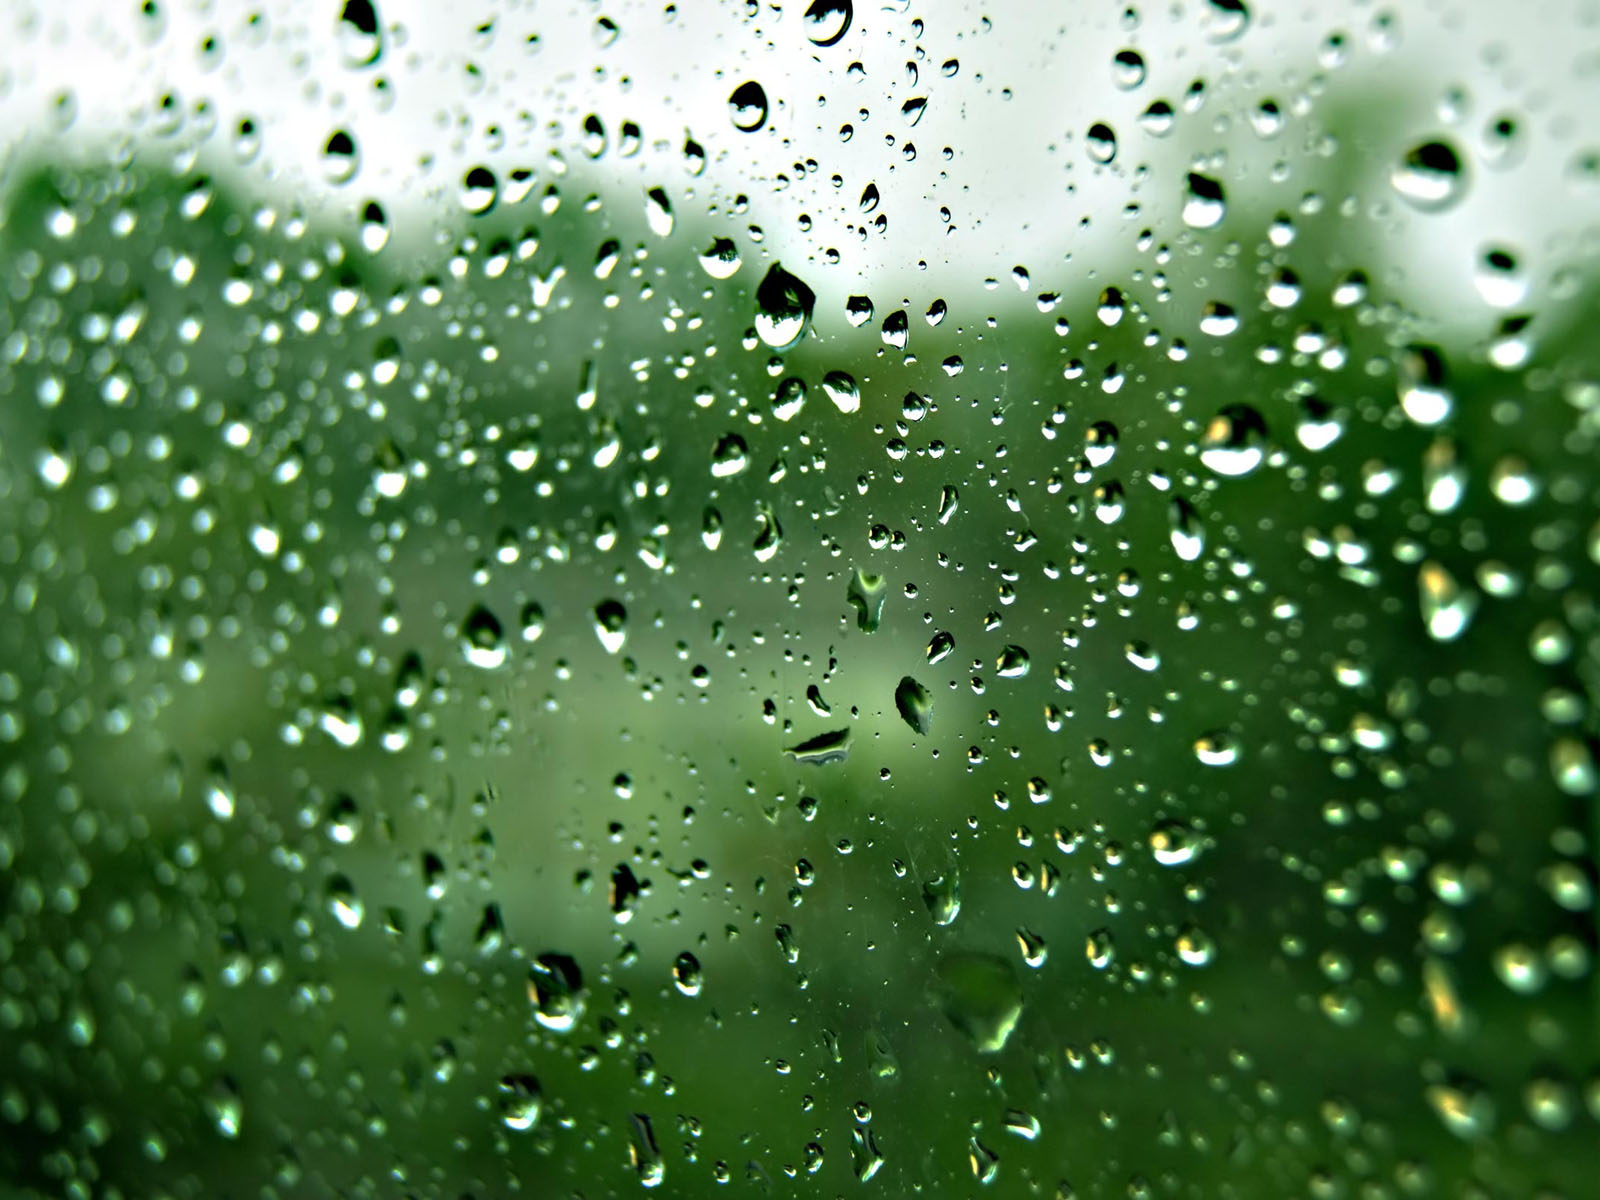 3d Water Drop Wallpaper Wallpapers Rain Drops On Glass Wallpapers